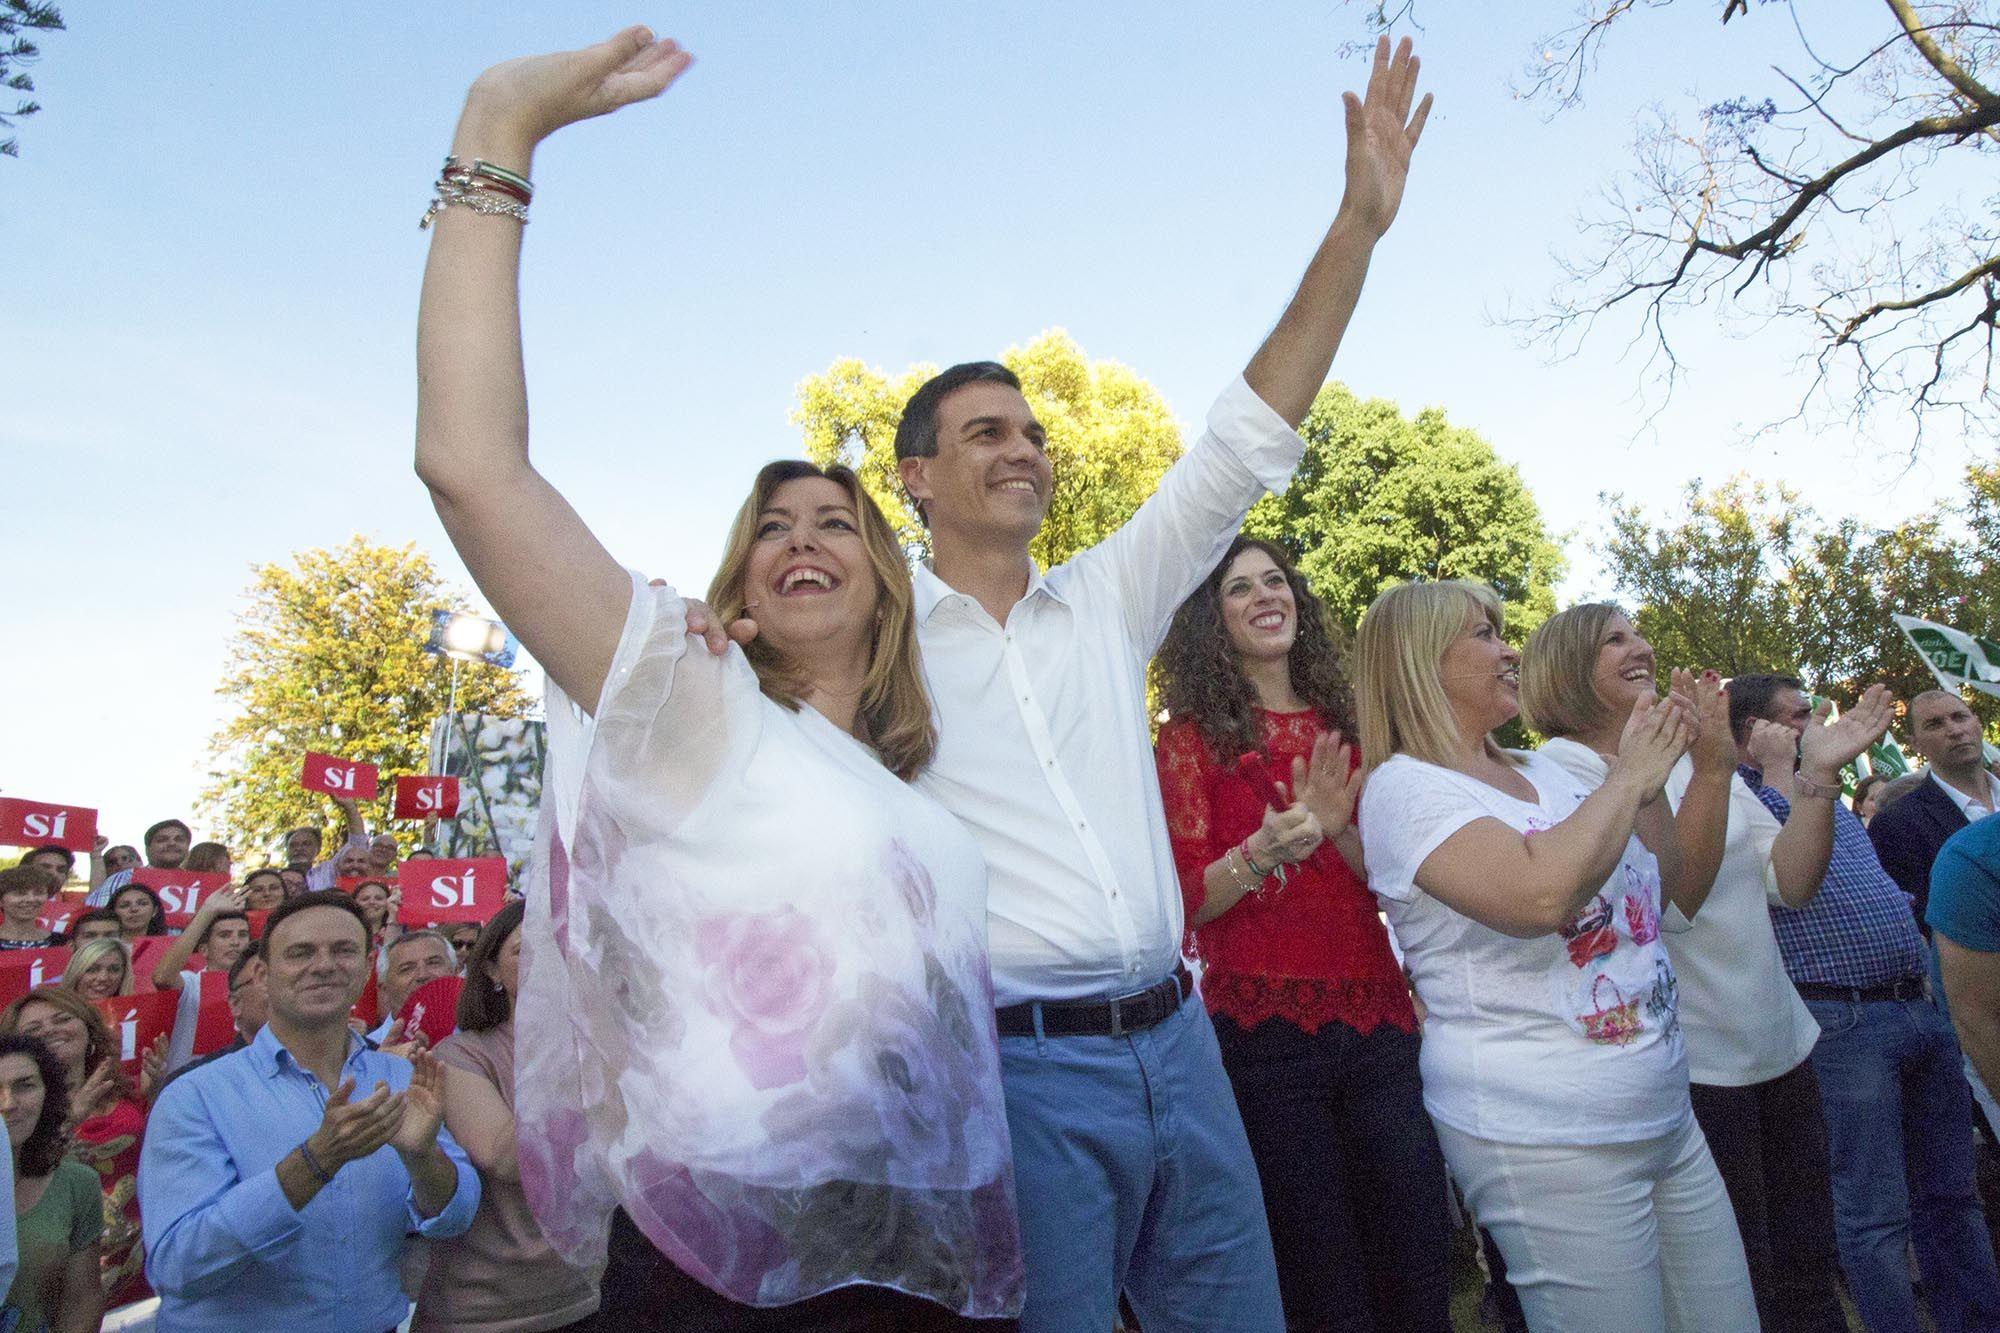 Pedro Sánchez junto a Susana Díaz en mitin de precampaña en jerez, 6JUN2016   Juan Carlos Corchado para MIRA Jerez